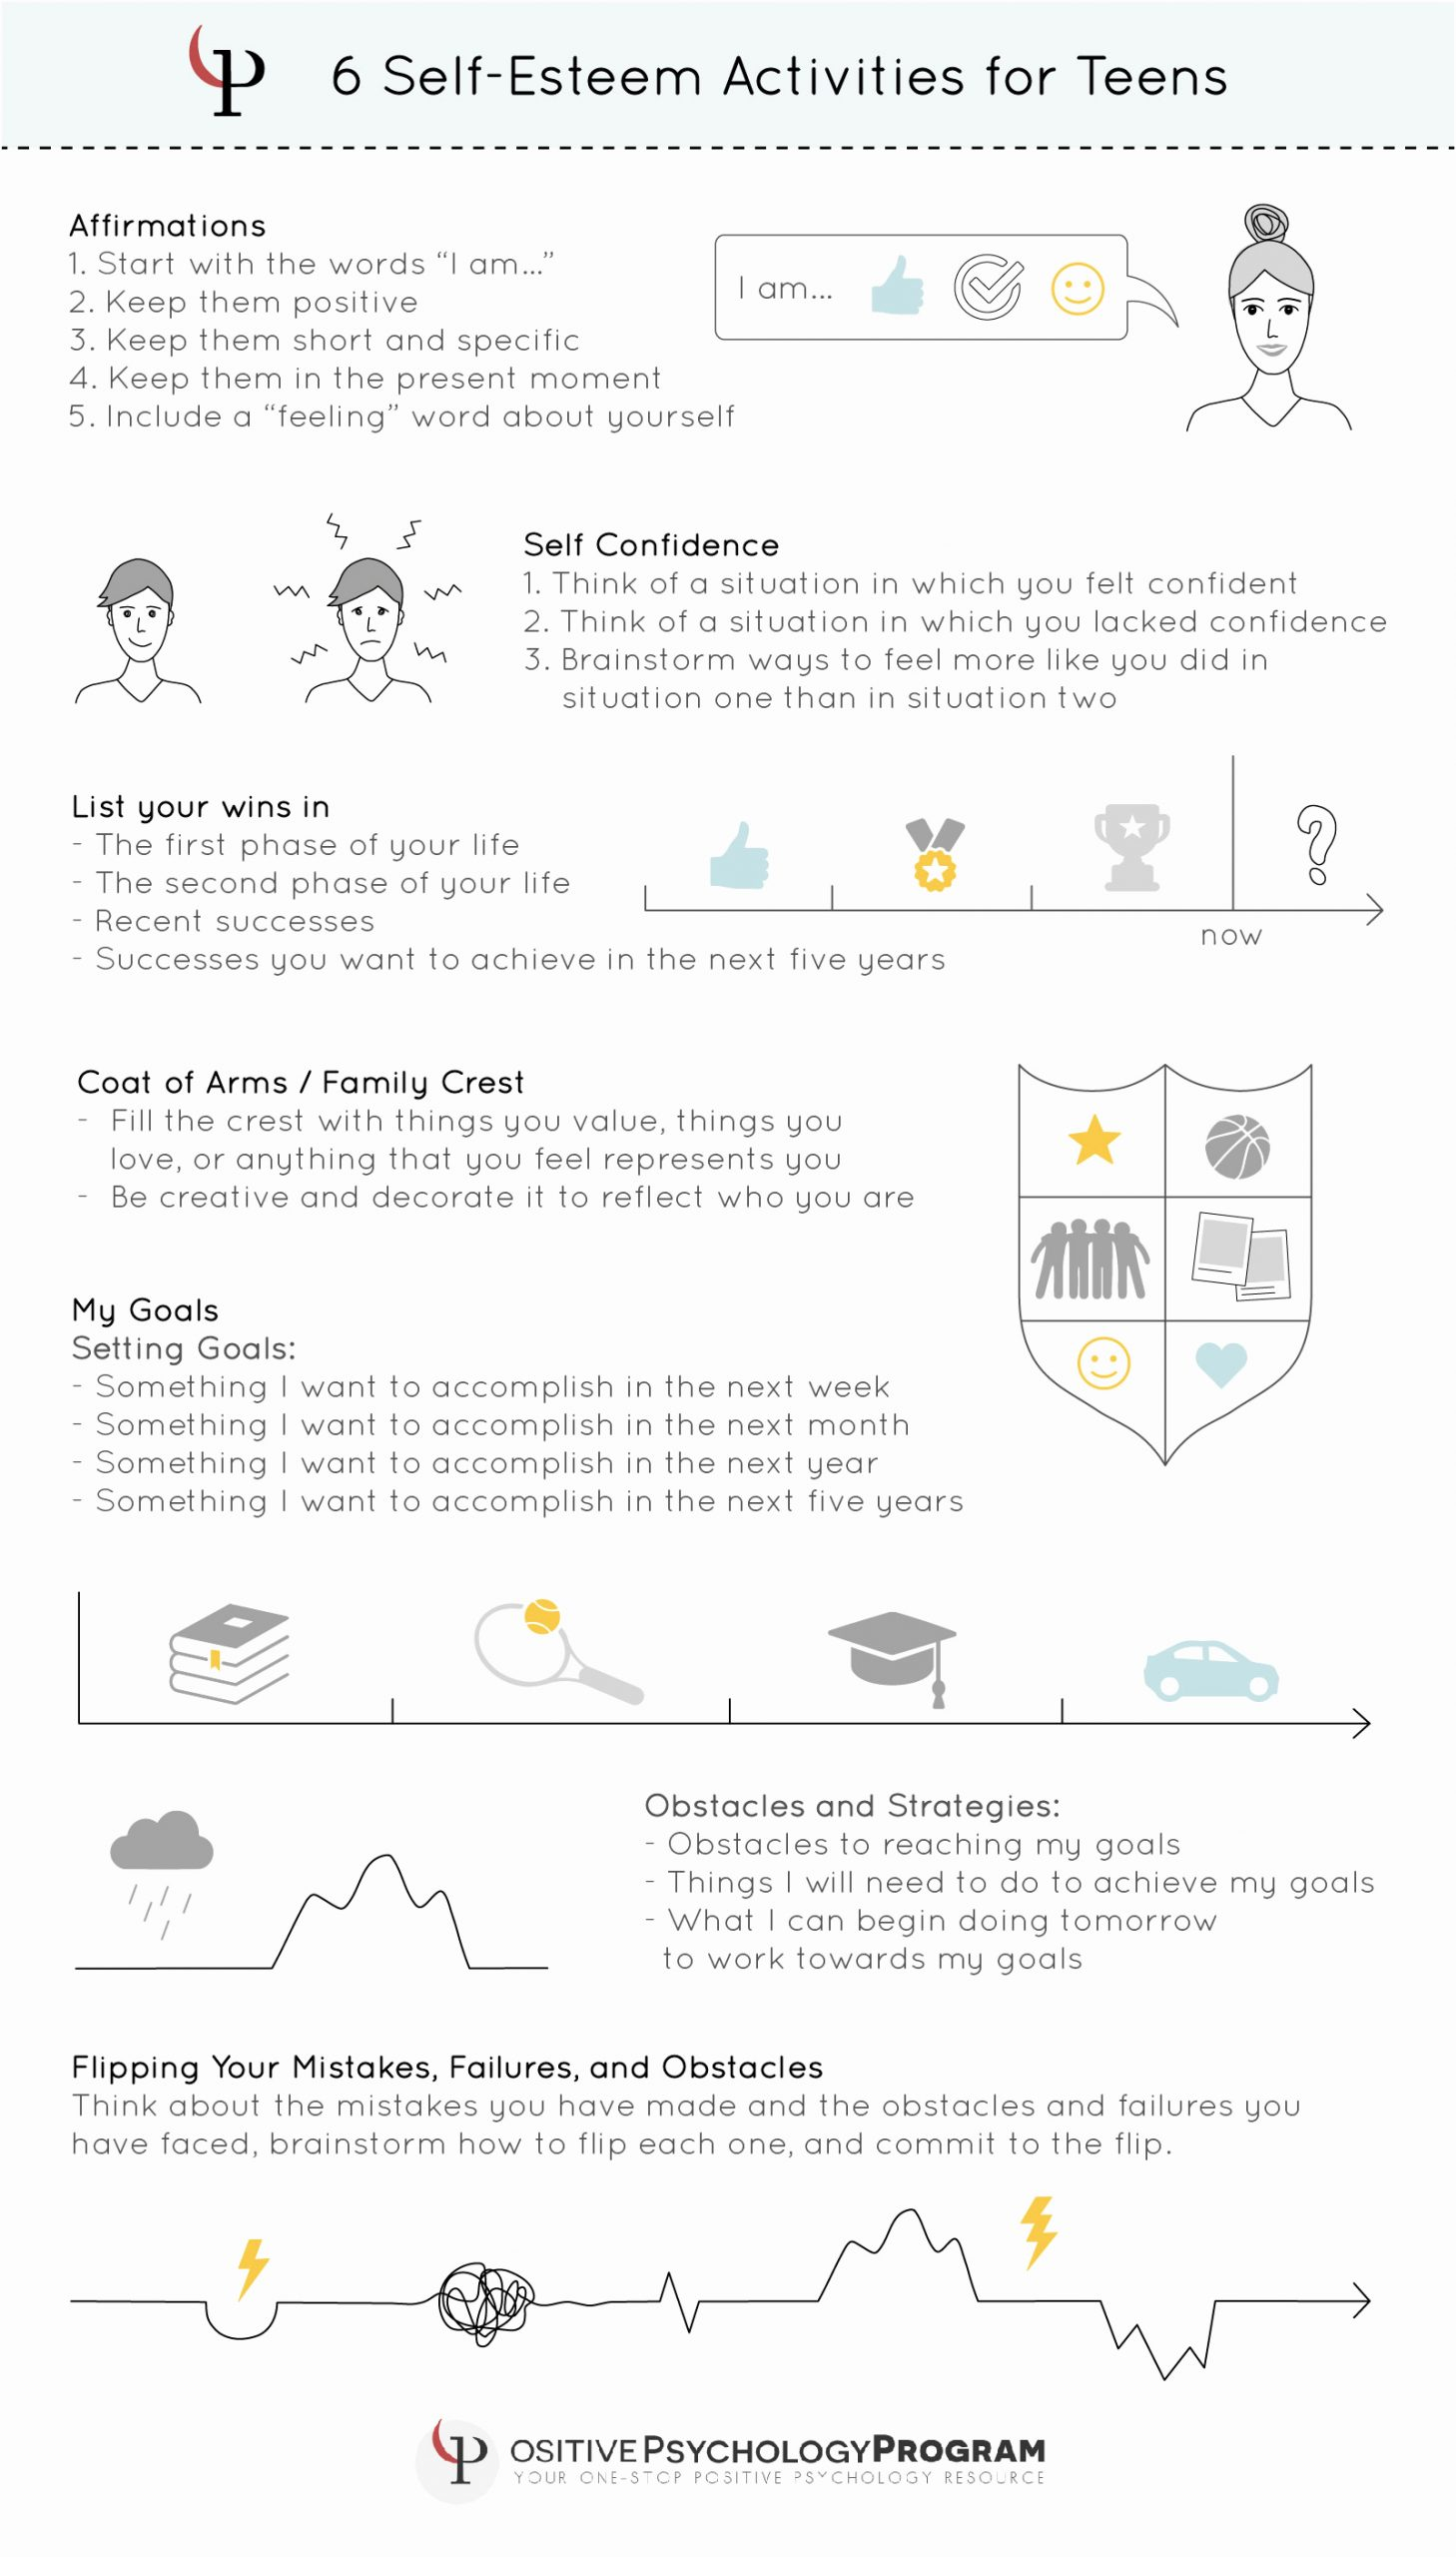 Self Esteem Activities Worksheets Lovely 18 Self Esteem Worksheets and Activities for Teens and